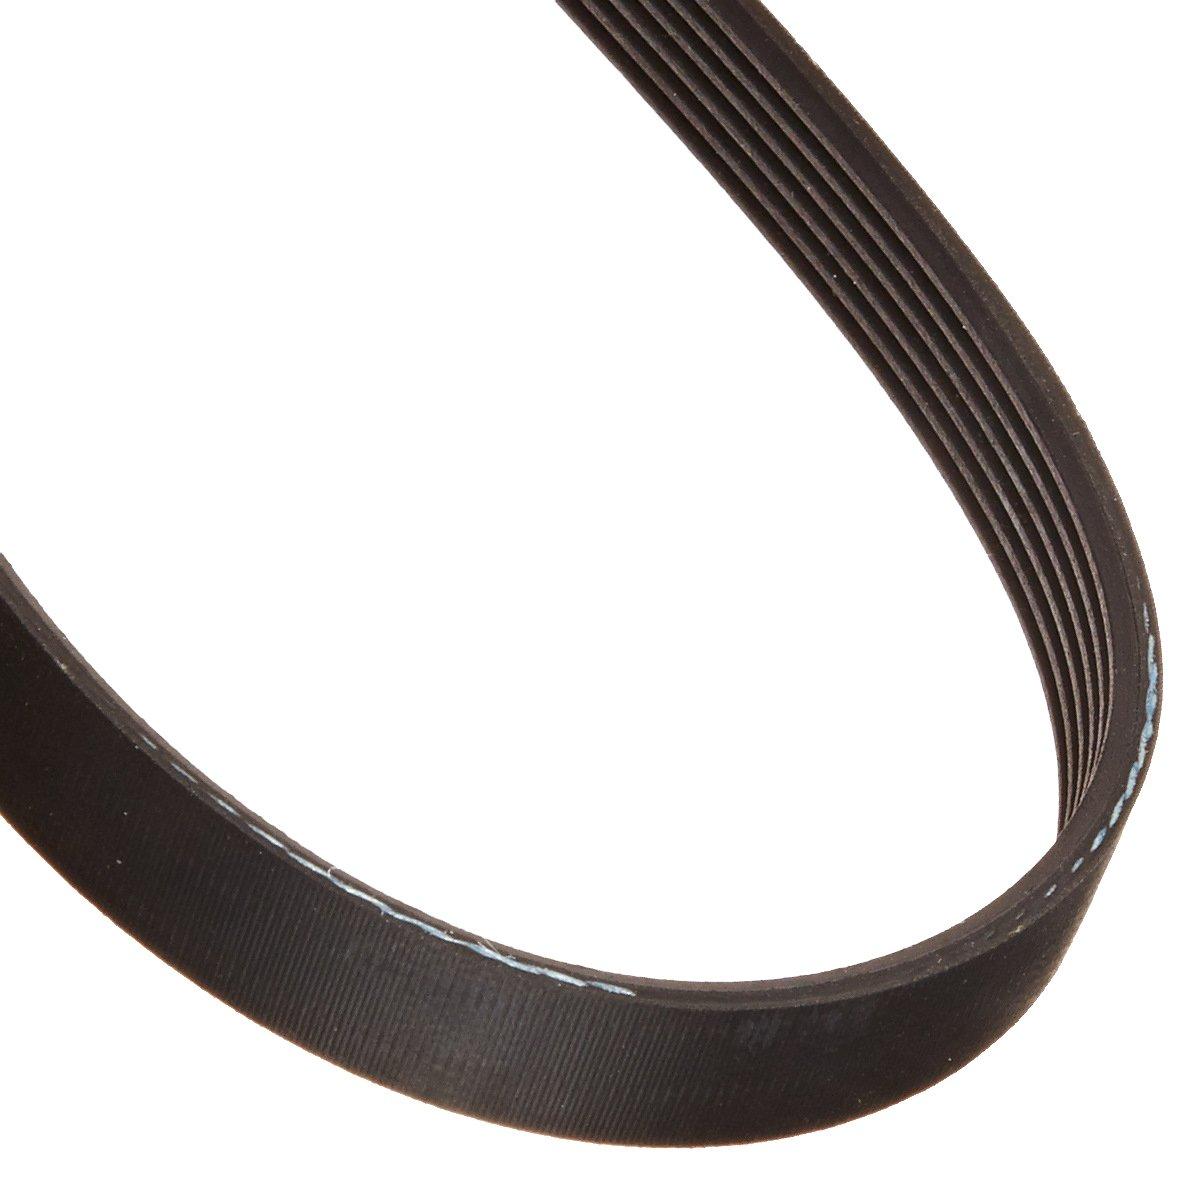 Gates 360j6 Micro V Belt J Section 360j Size 36 Length 4 7 Power Transmission Gt Belts Pulleys Width 6 Rib Industrial Scientific